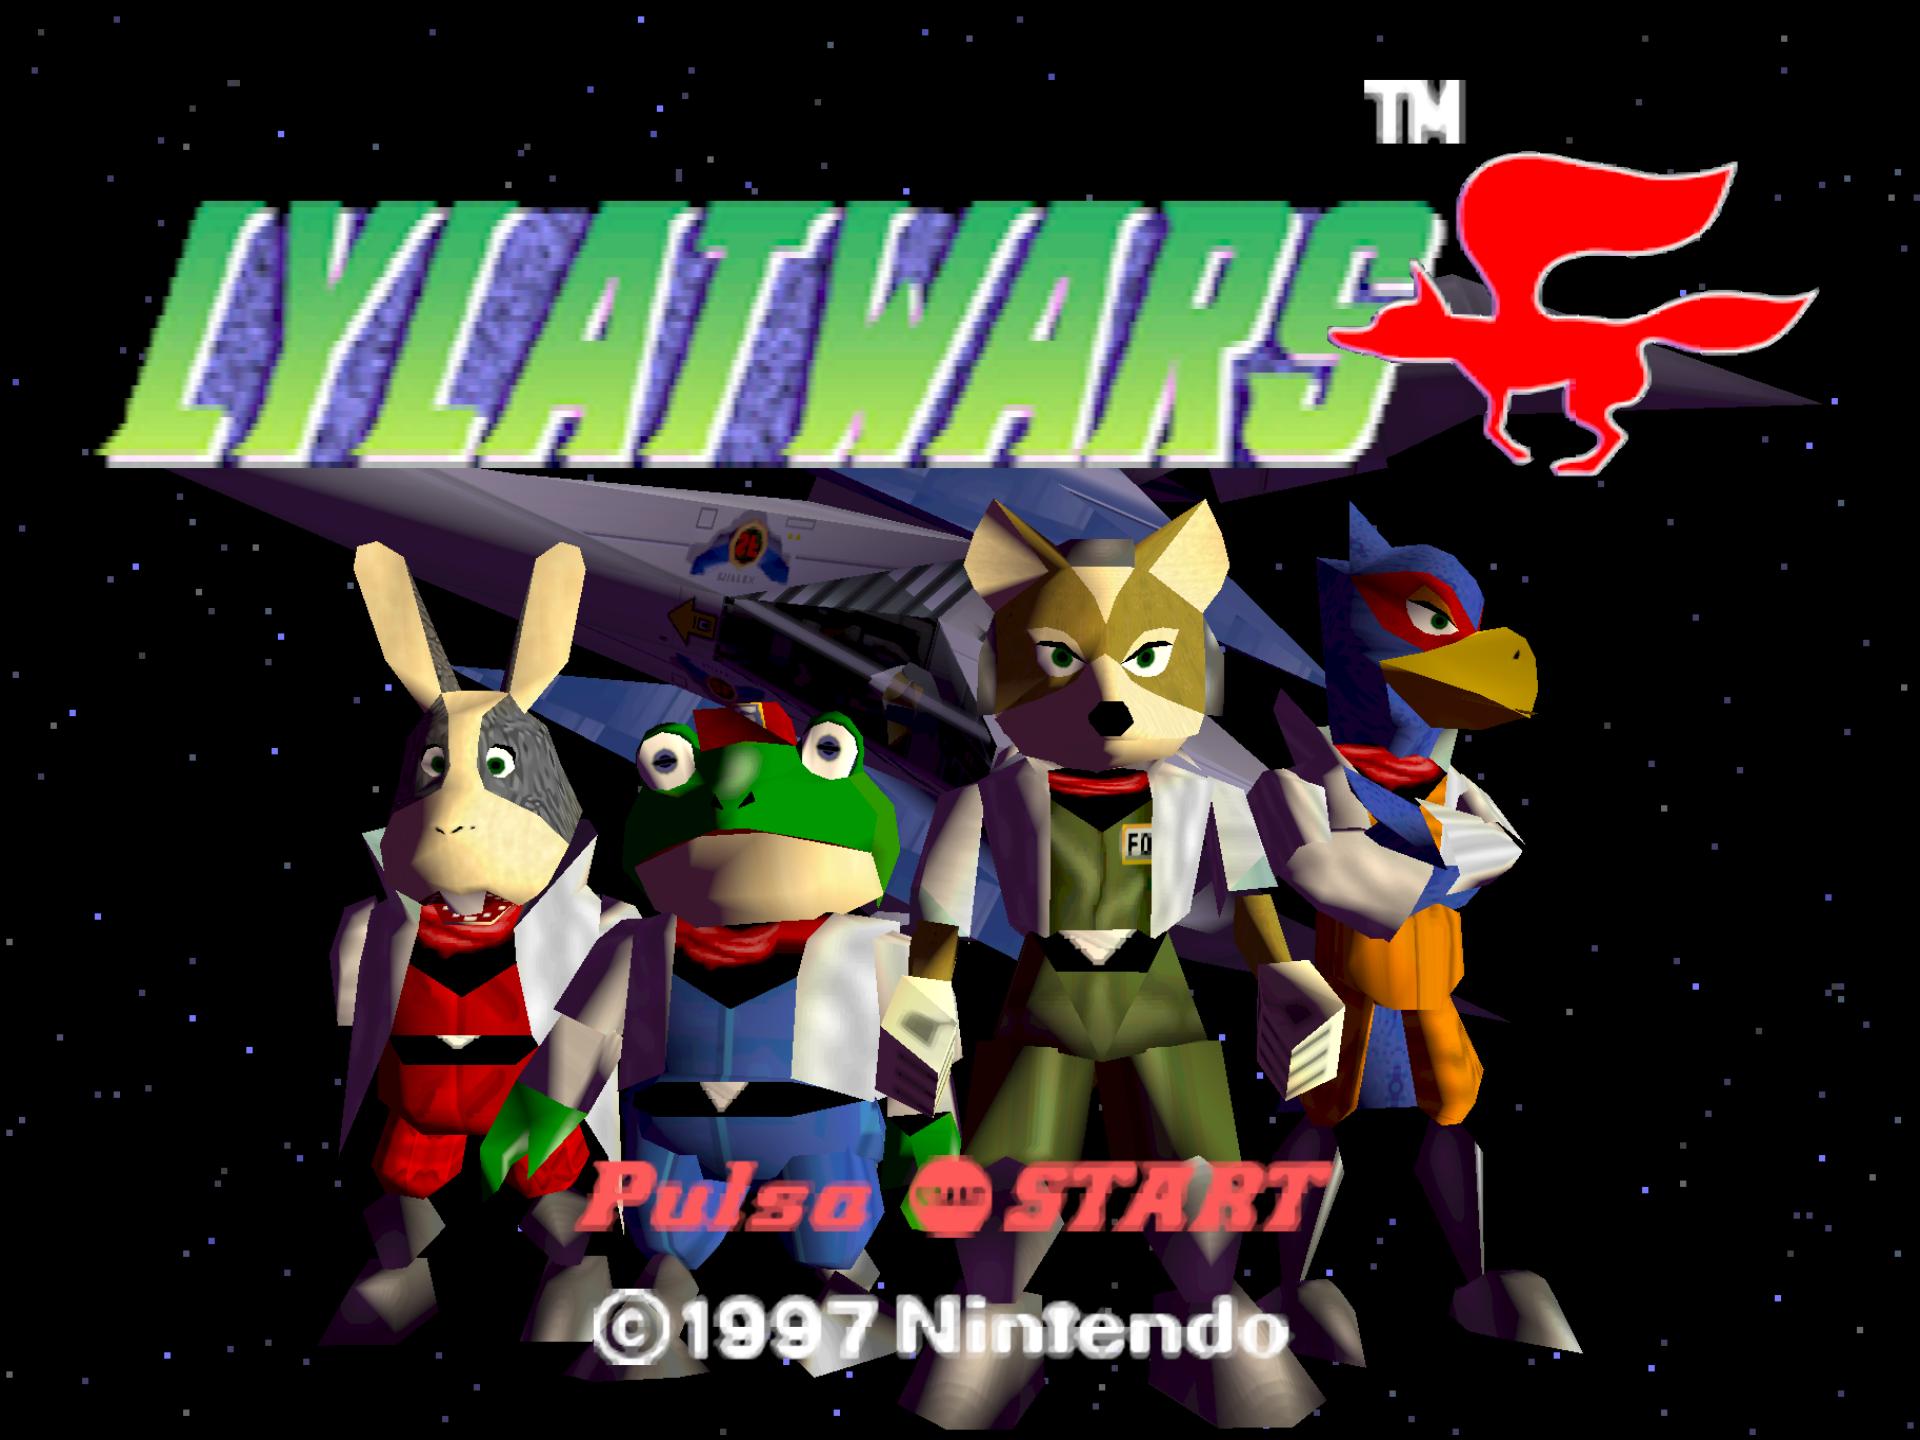 Star Fox 64 [N64] [Roms Nintendo en Español]-190923-192056